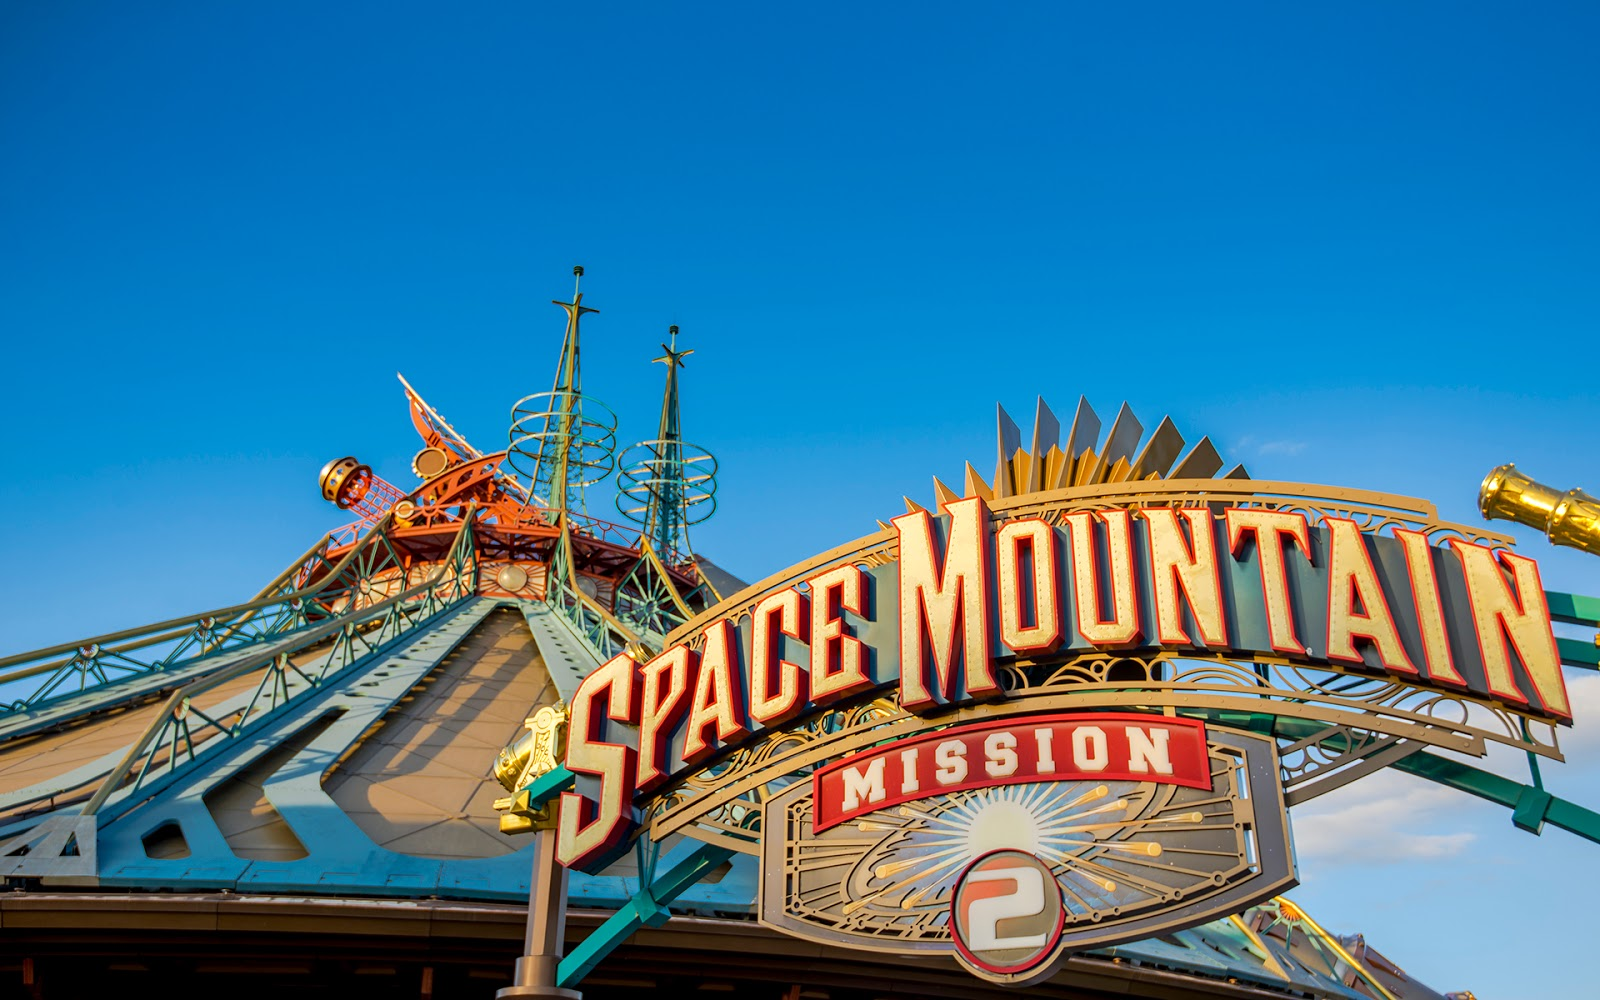 En quelle année space mountain